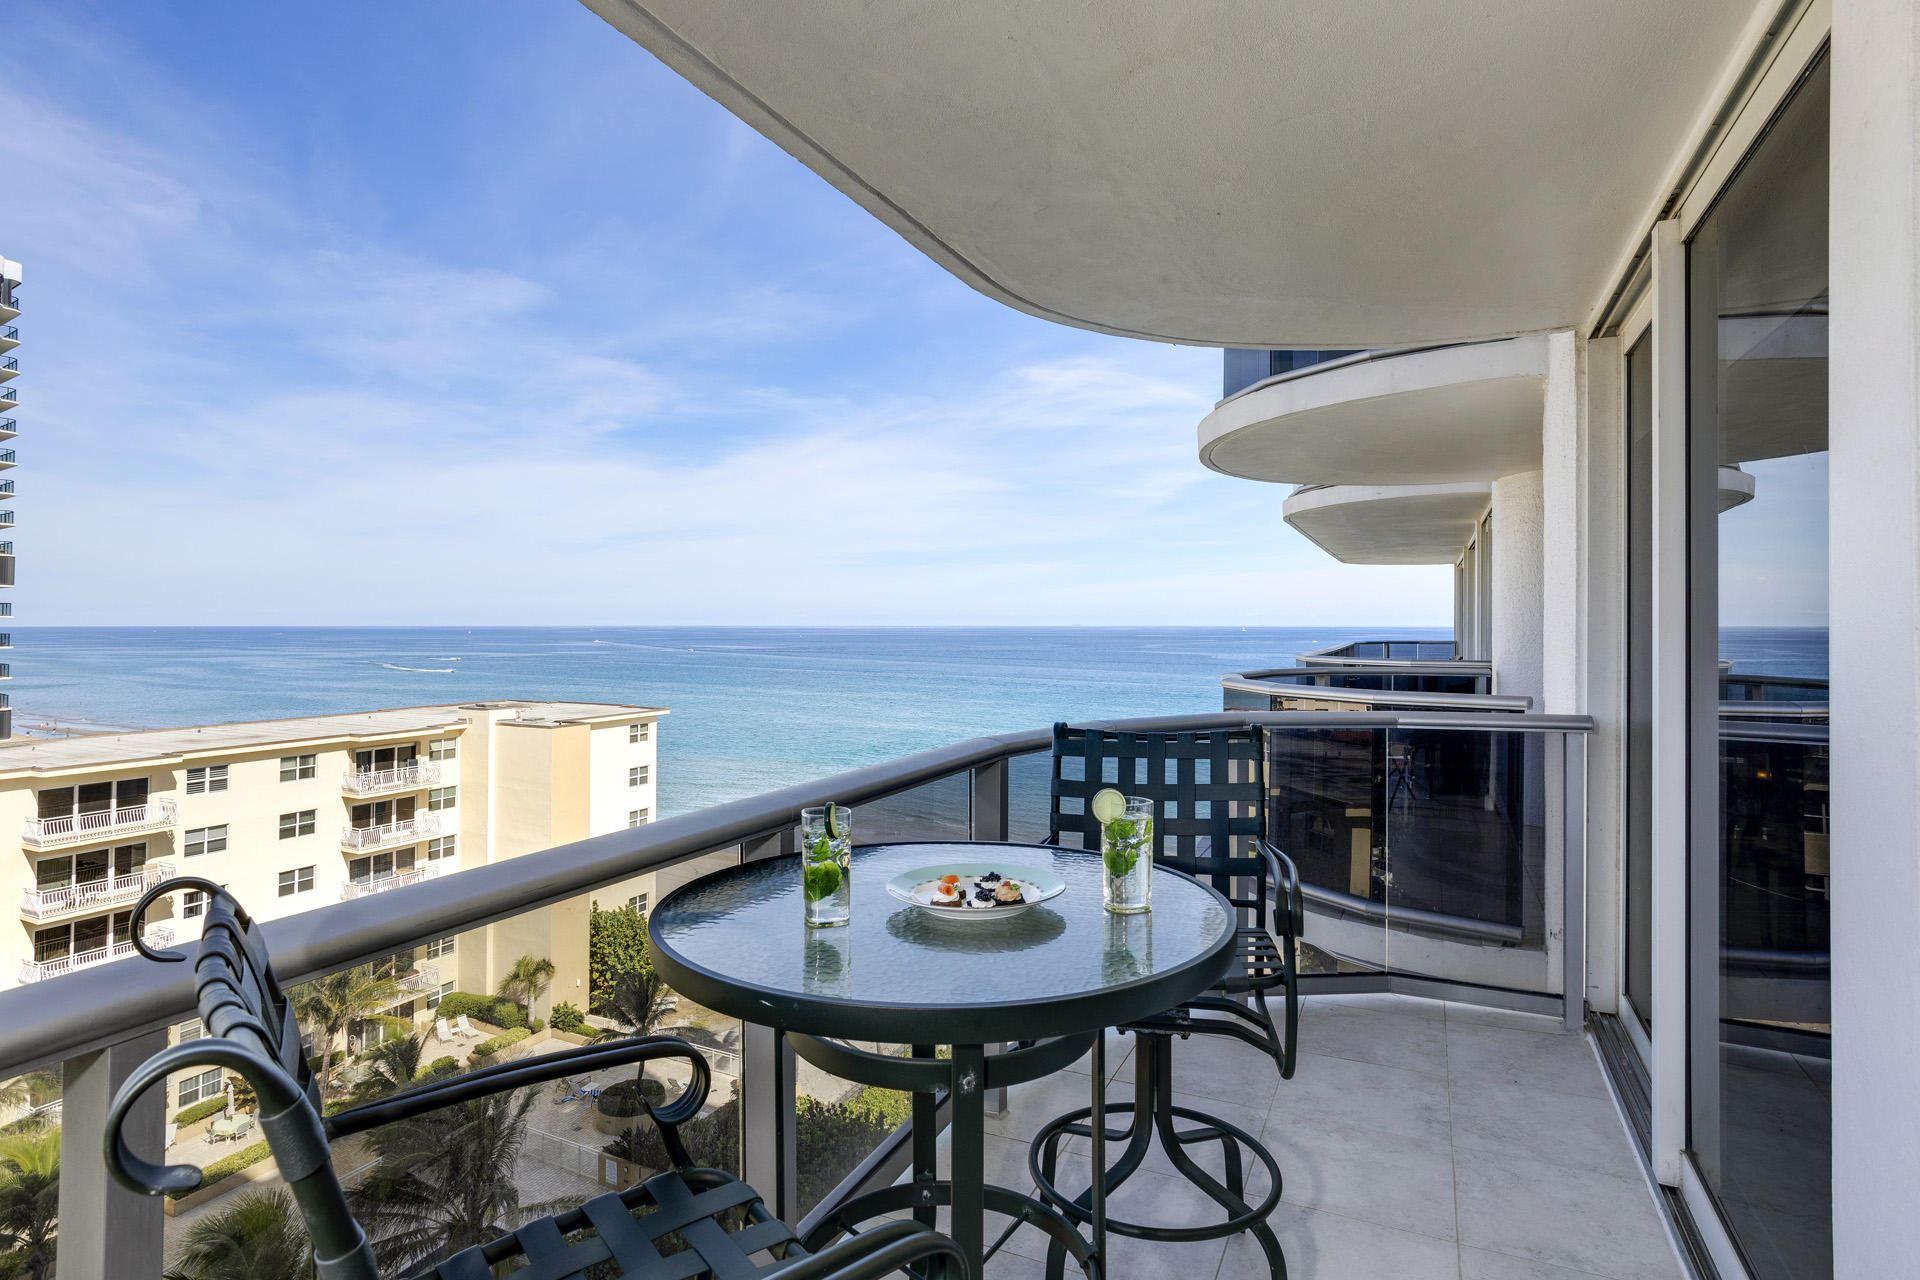 Photo of 350 S Ocean Boulevard #8-C, Boca Raton, FL 33432 (MLS # RX-10666983)